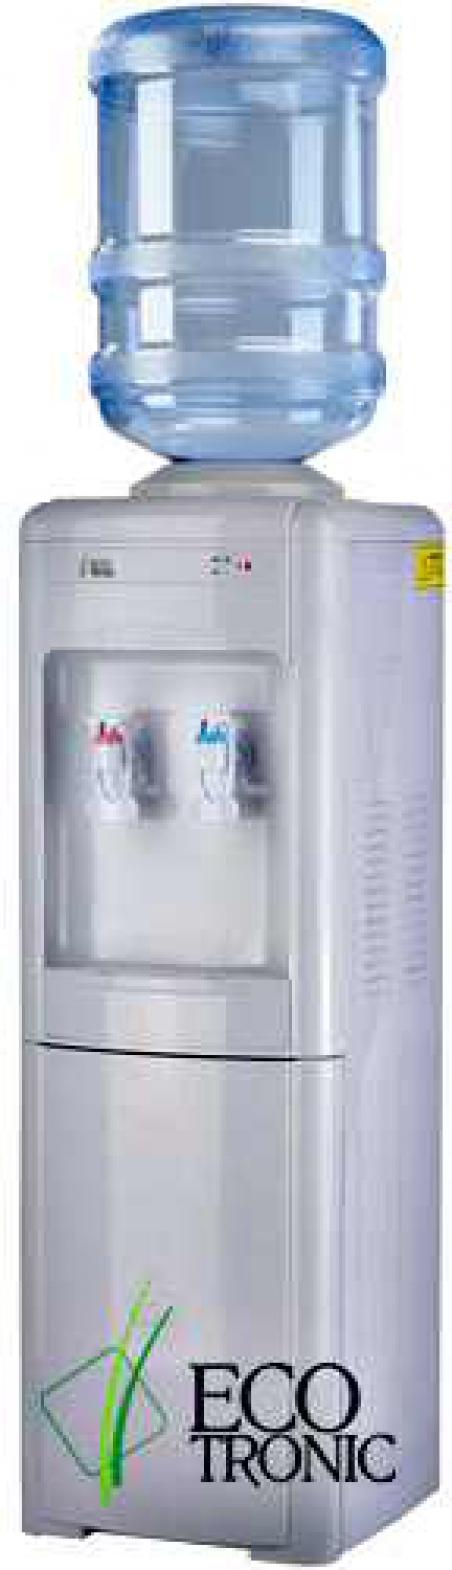 Кулер для воды Ecotronic H2-LF - 112